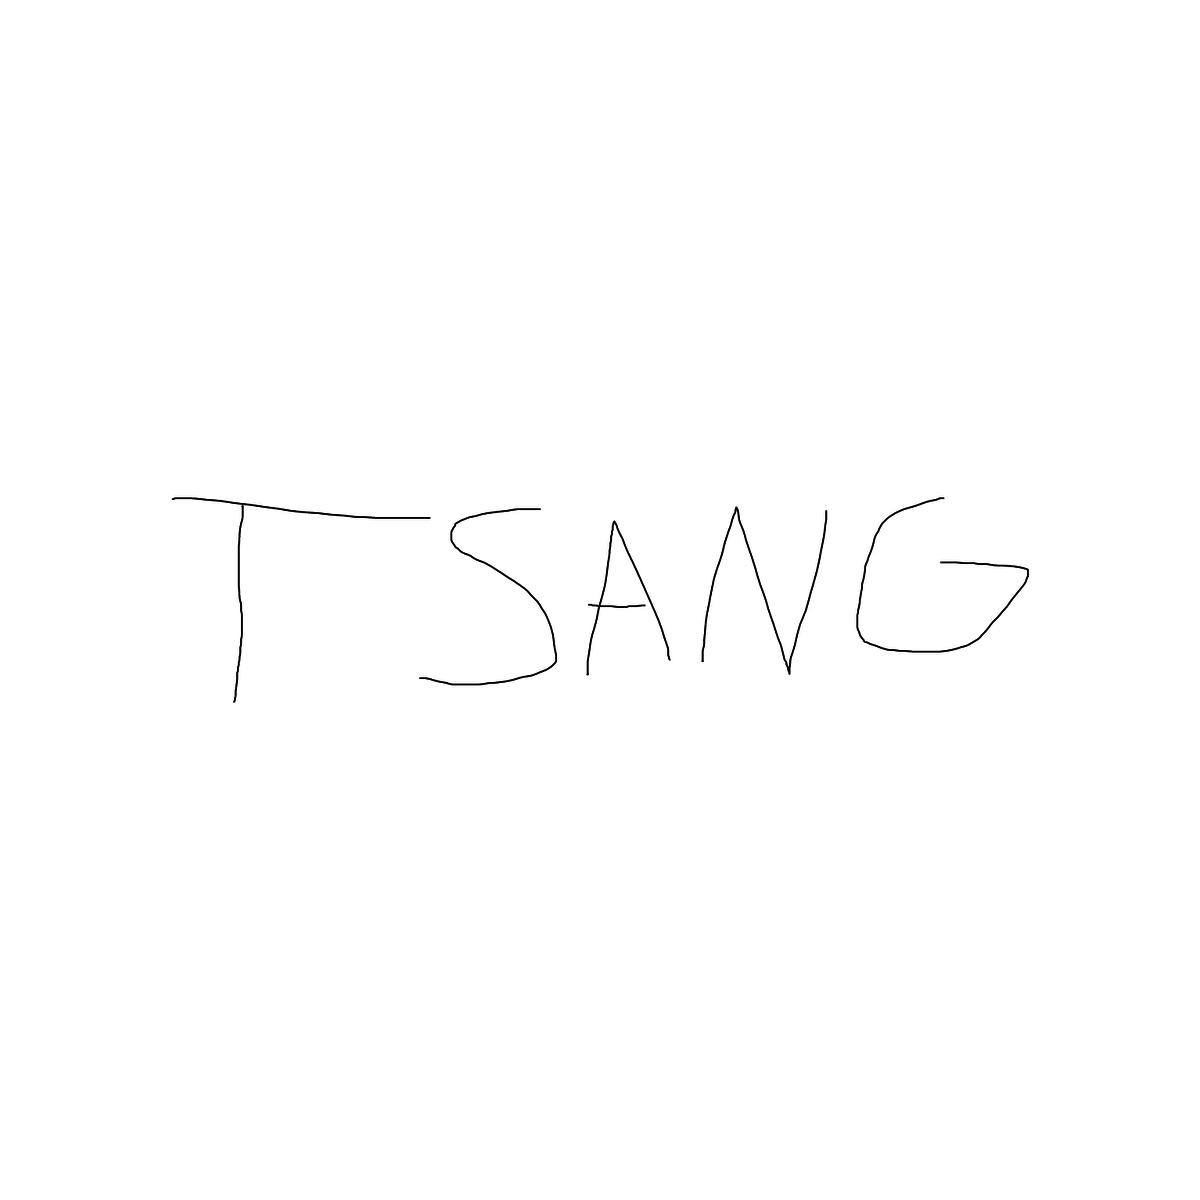 BAAAM drawing#17663 lat:49.3000030517578100lng: -122.7786636352539000